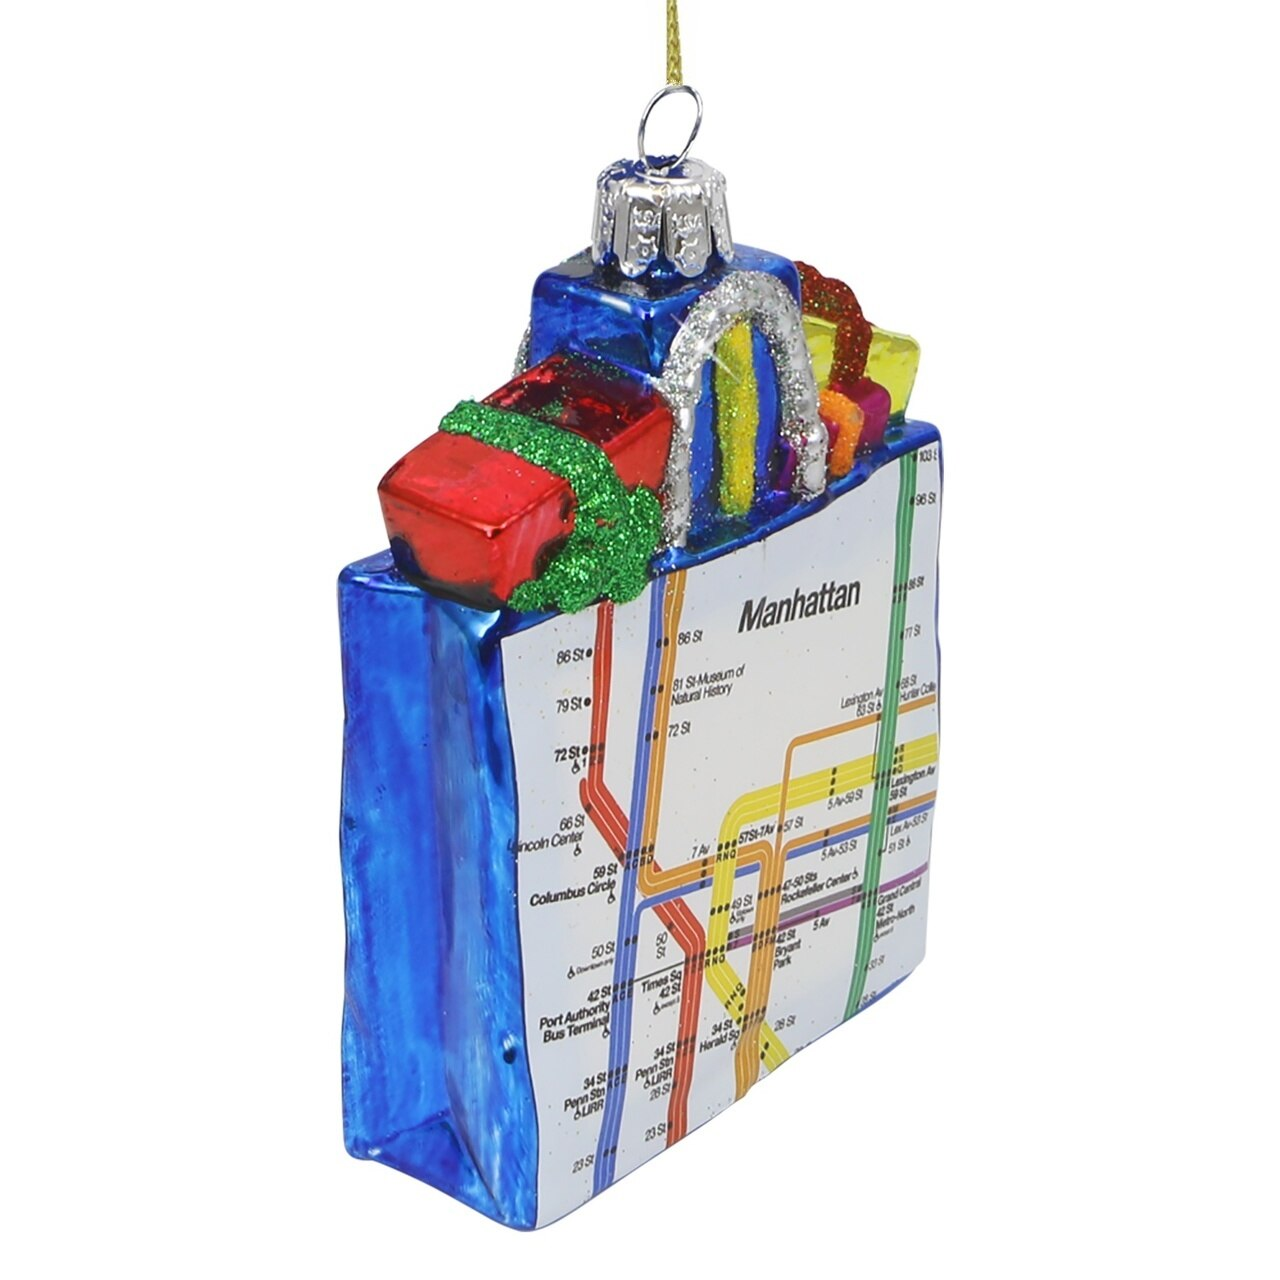 1280x1280 Glass Mta Subway Map Bag Inch